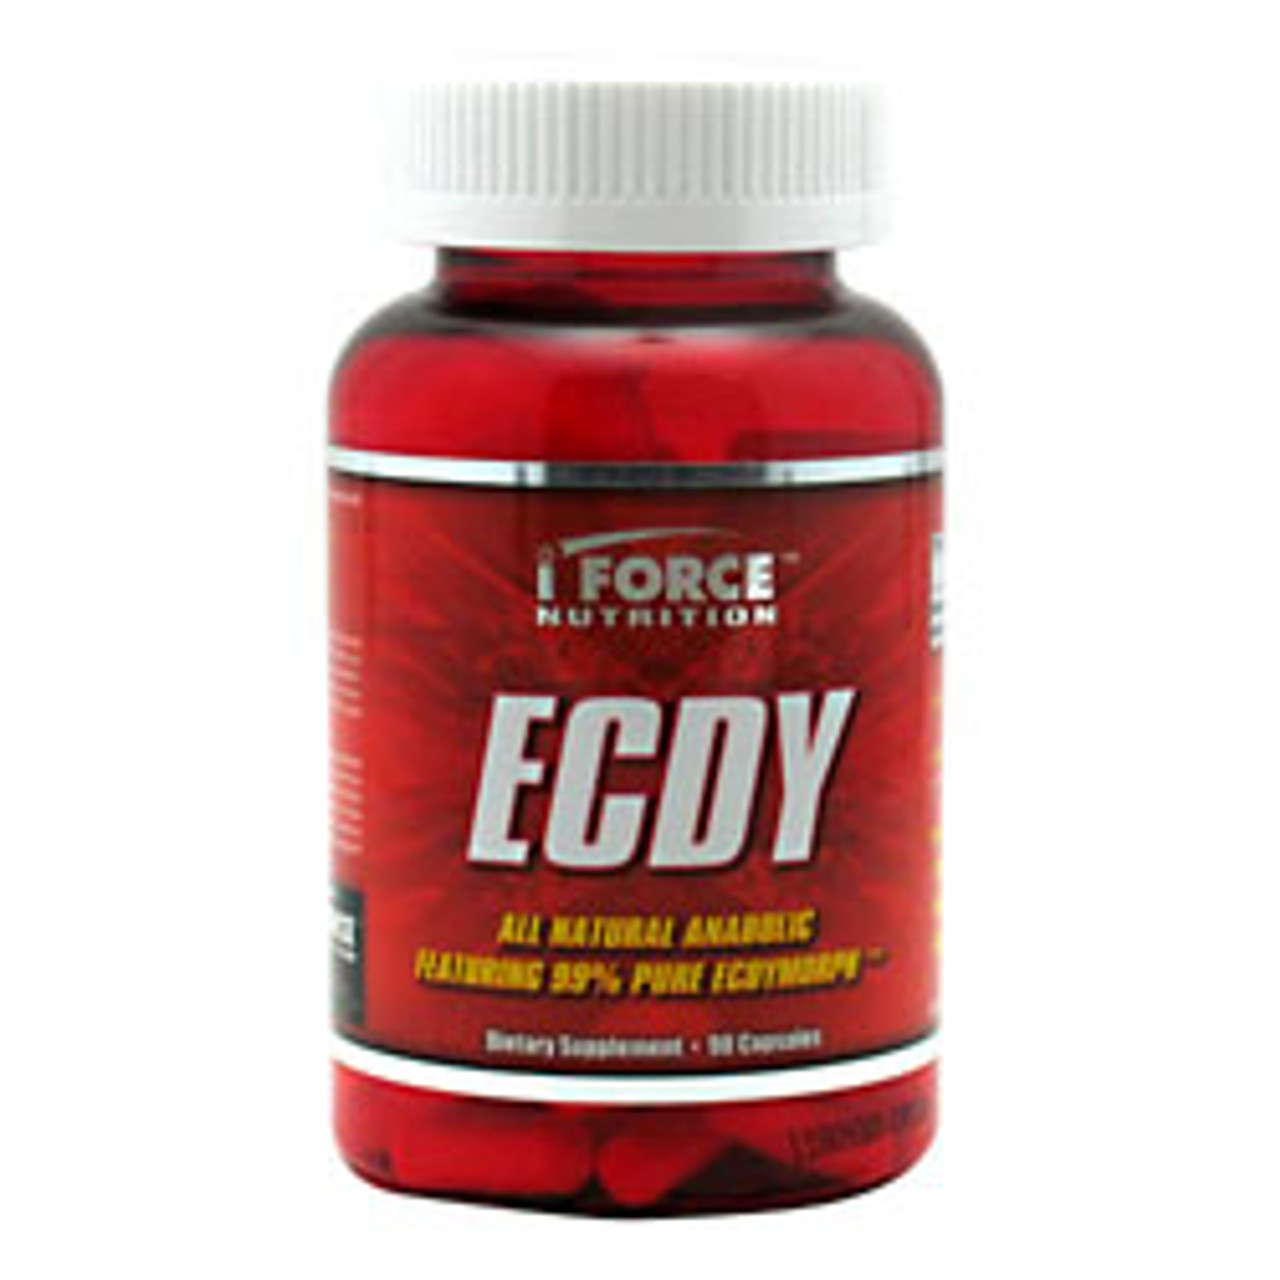 ECDY 90ct iForce